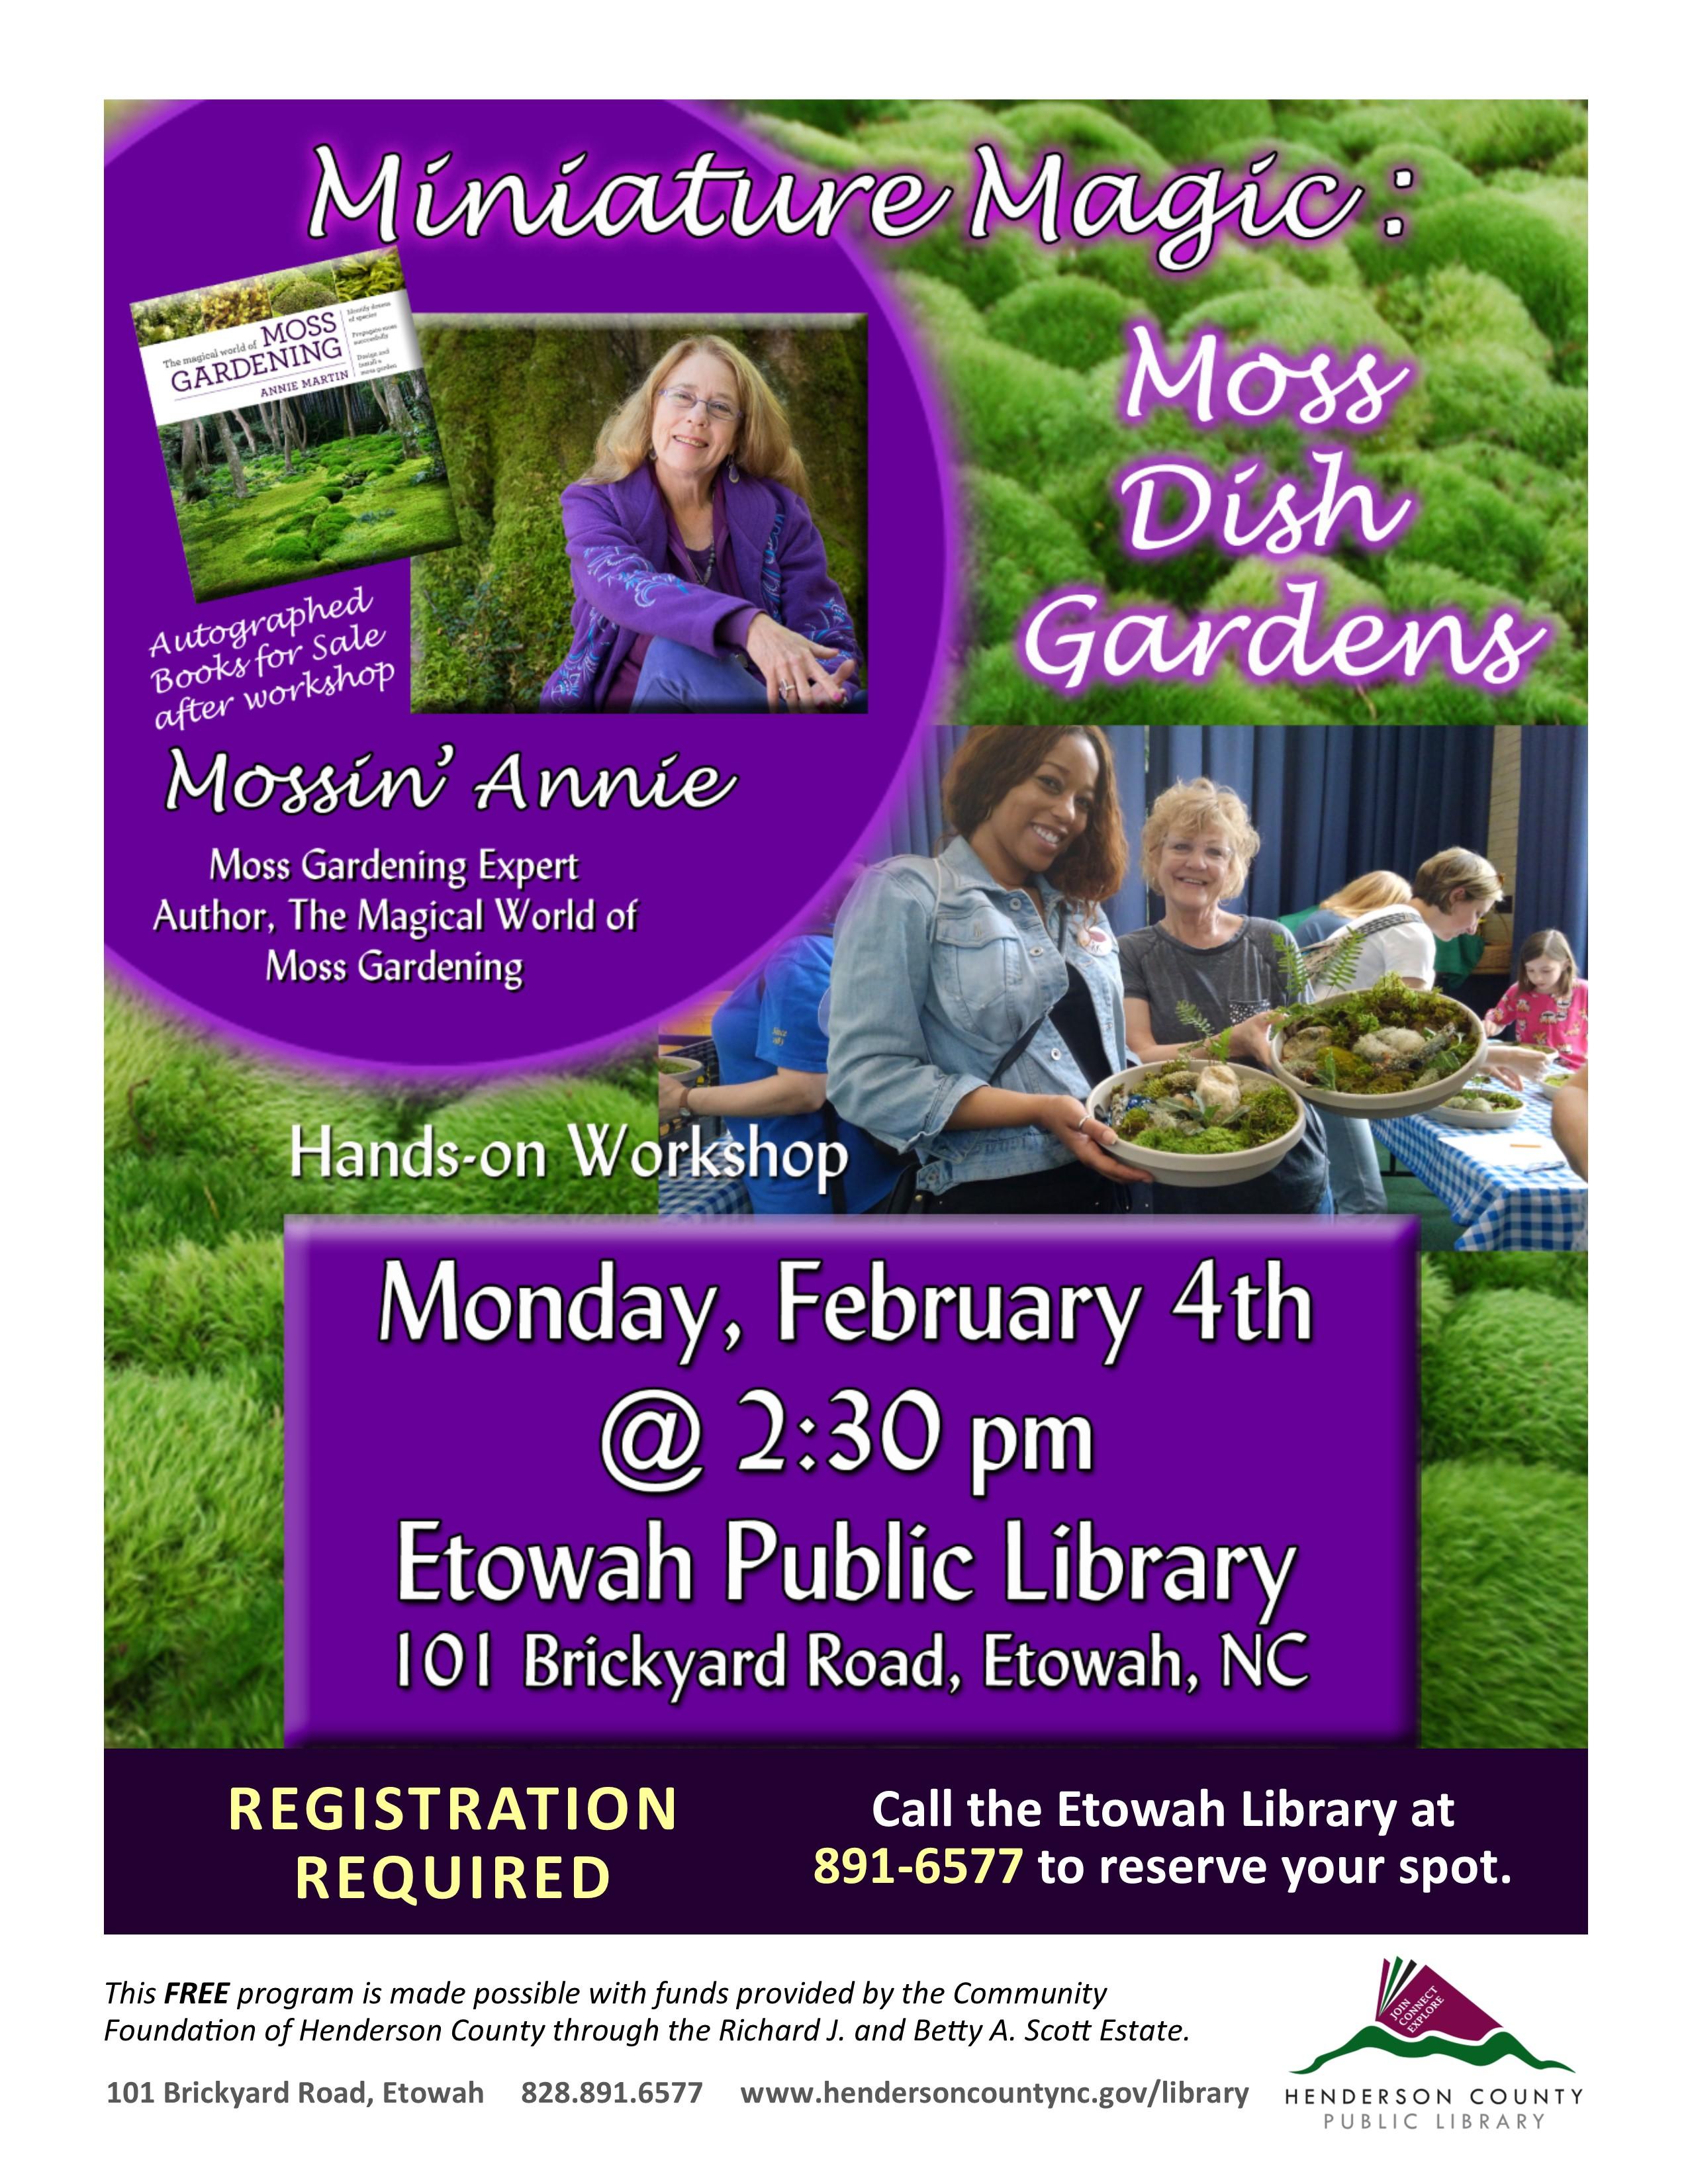 Miniature Magic: Moss Dish Gardens